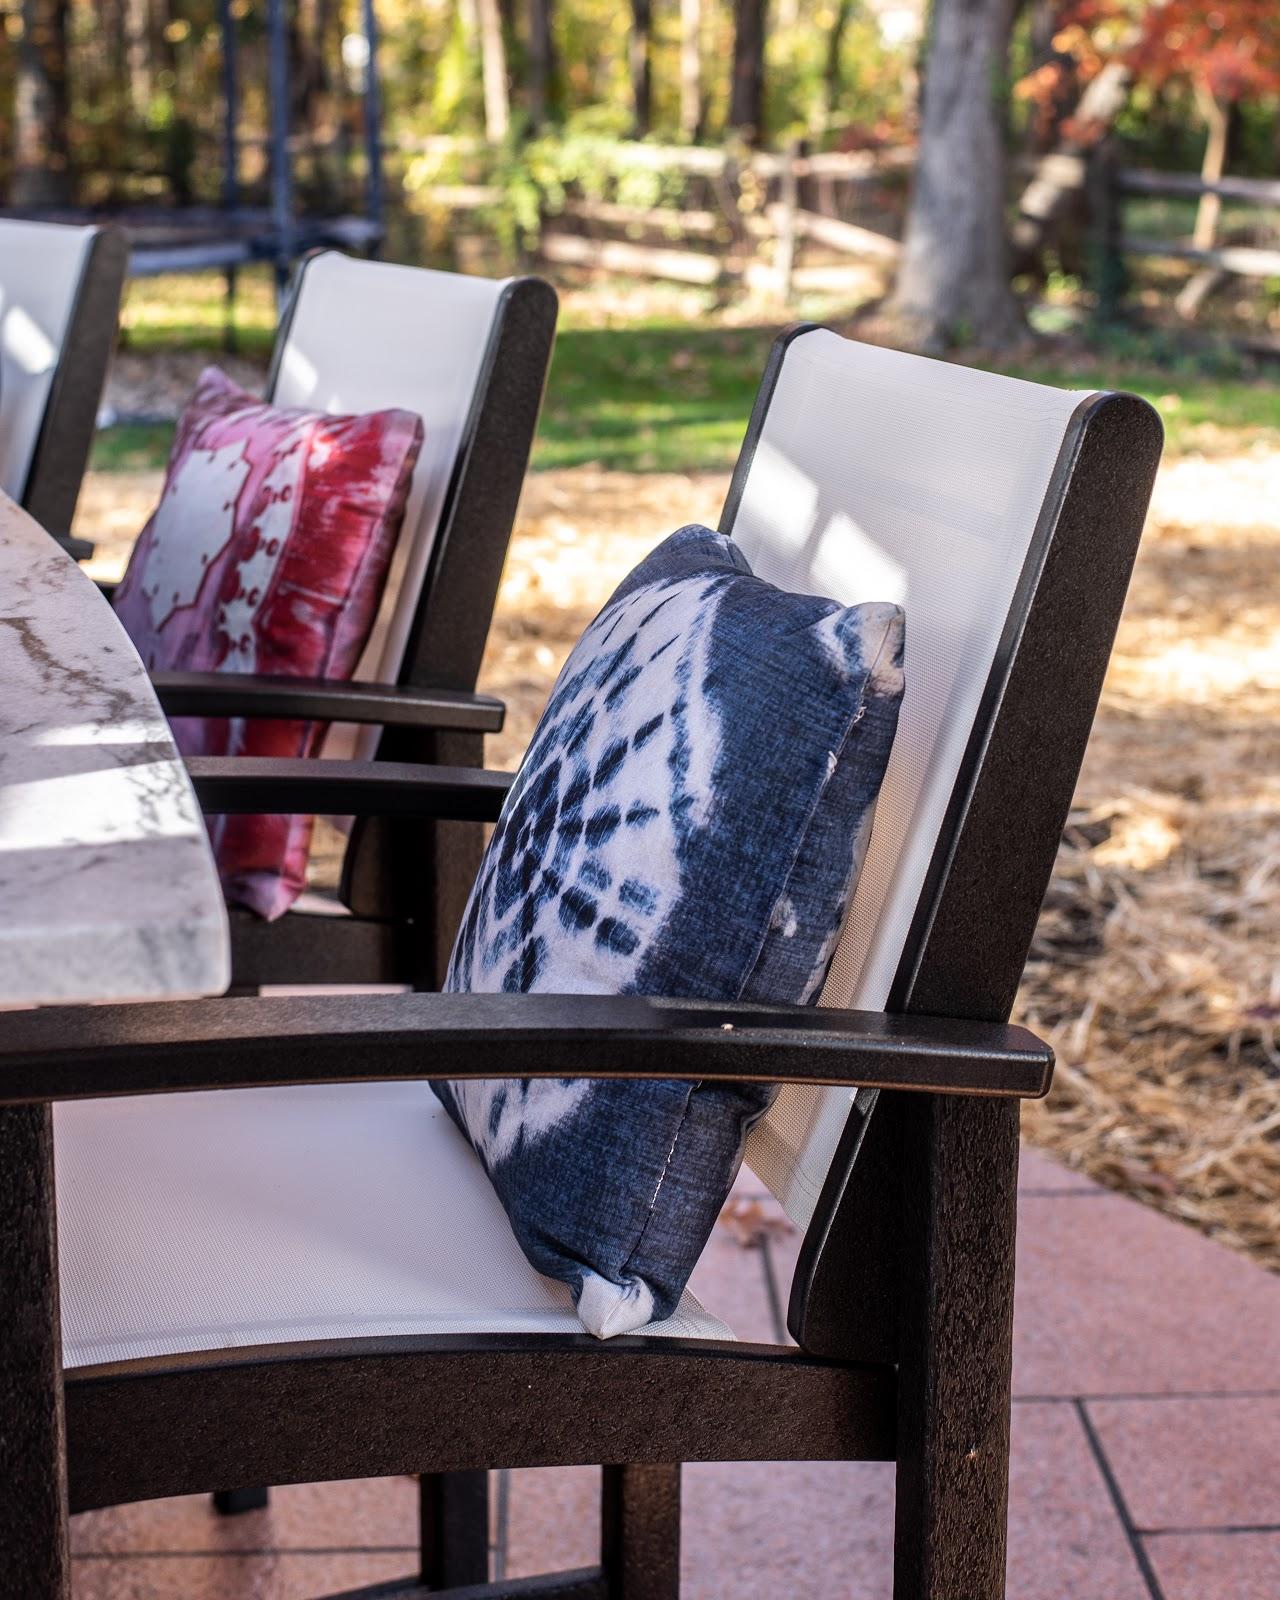 Seating arrangements in the backyard